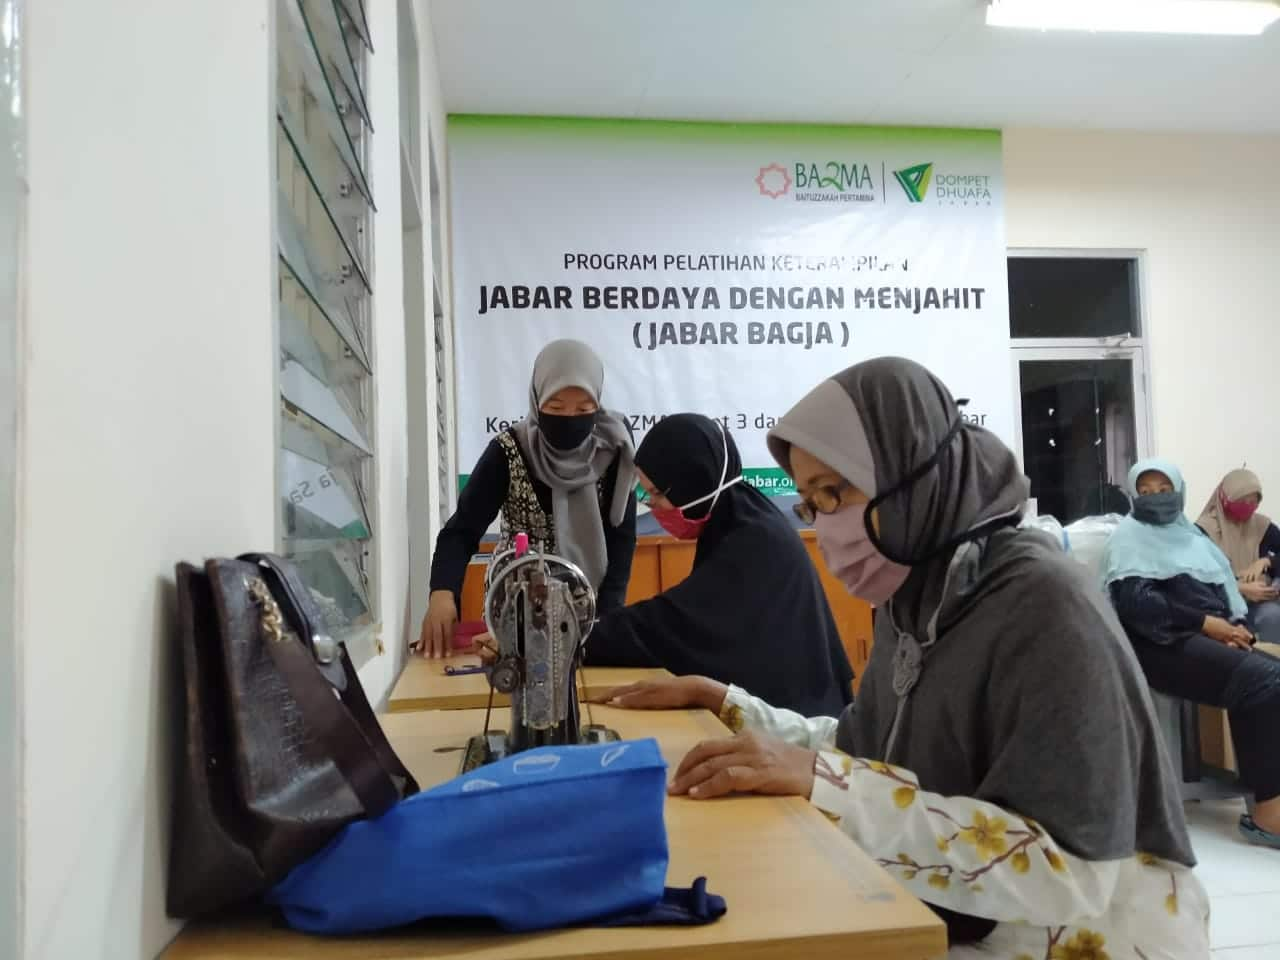 Read more about the article Dompet Dhuafa Jabar dan BAZMA Asset 3 Pertamina Gulirkan Program Pelatihan Menjahit